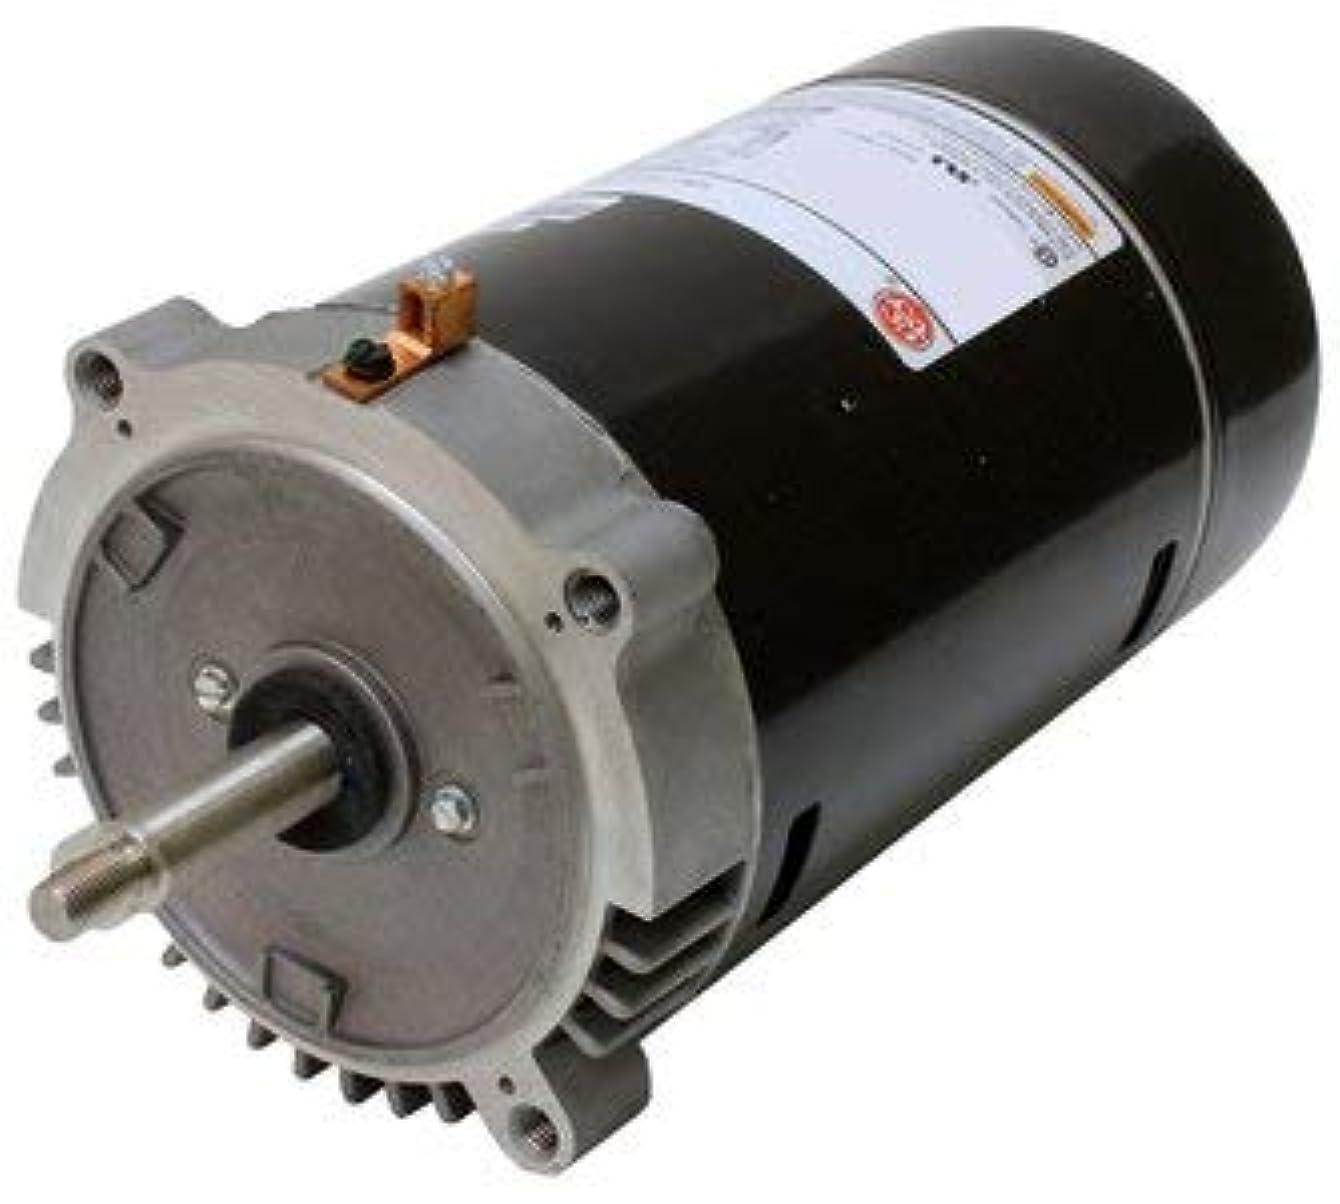 1 hp 3450 RPM 56J 115/230V Swimming Pool Pump Motor - US Electric Motor # AST125